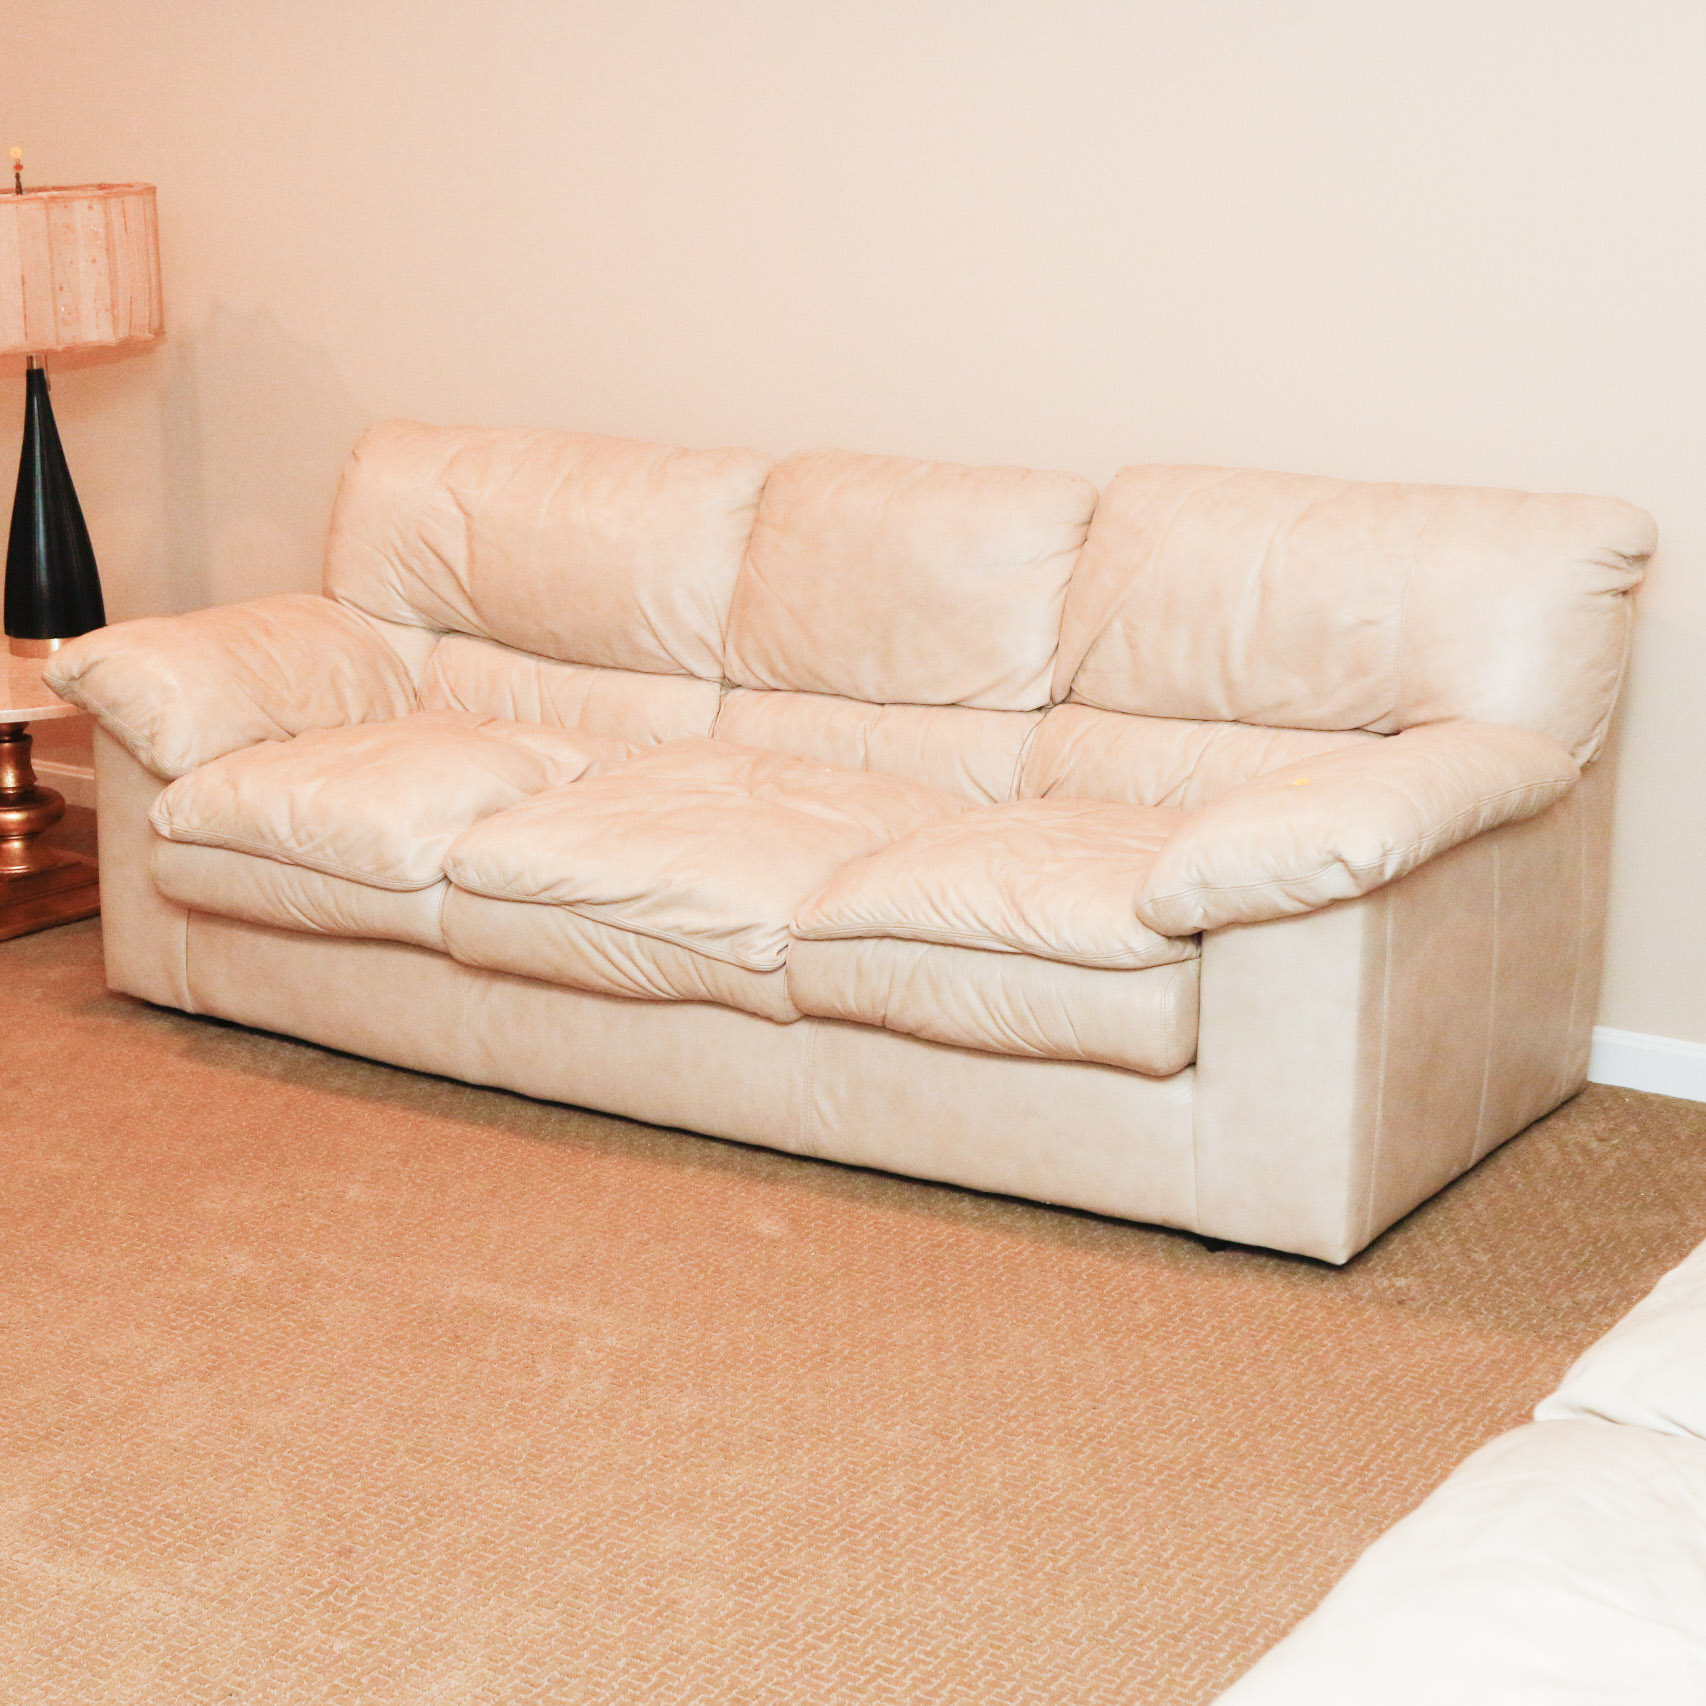 Viewpoint Leather Works Cream Sofa 2 Ebth